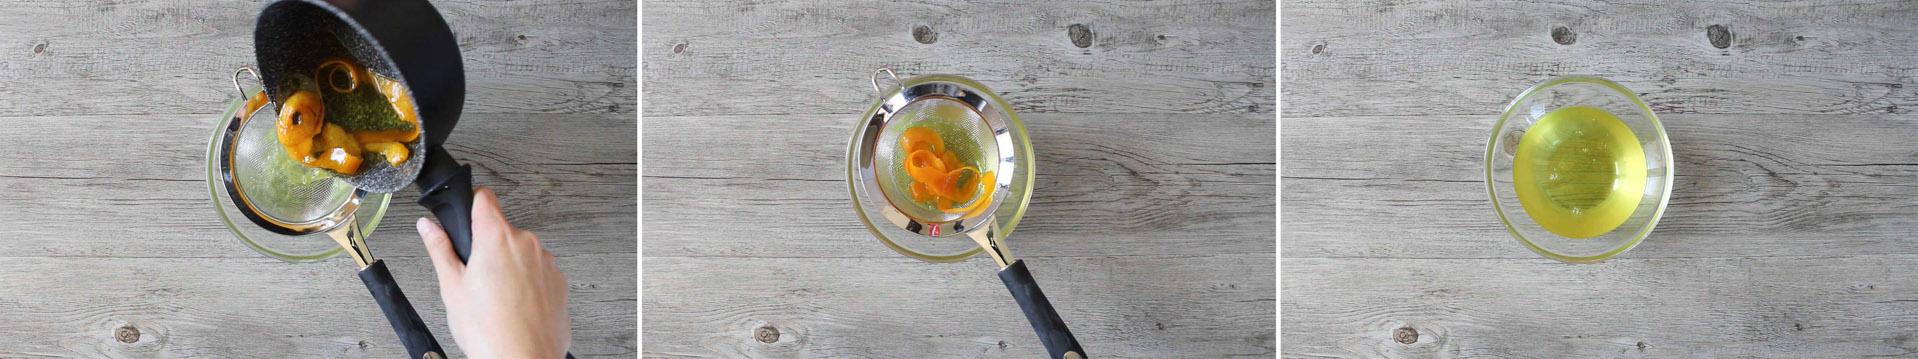 come fare bagna arancia e cointreau